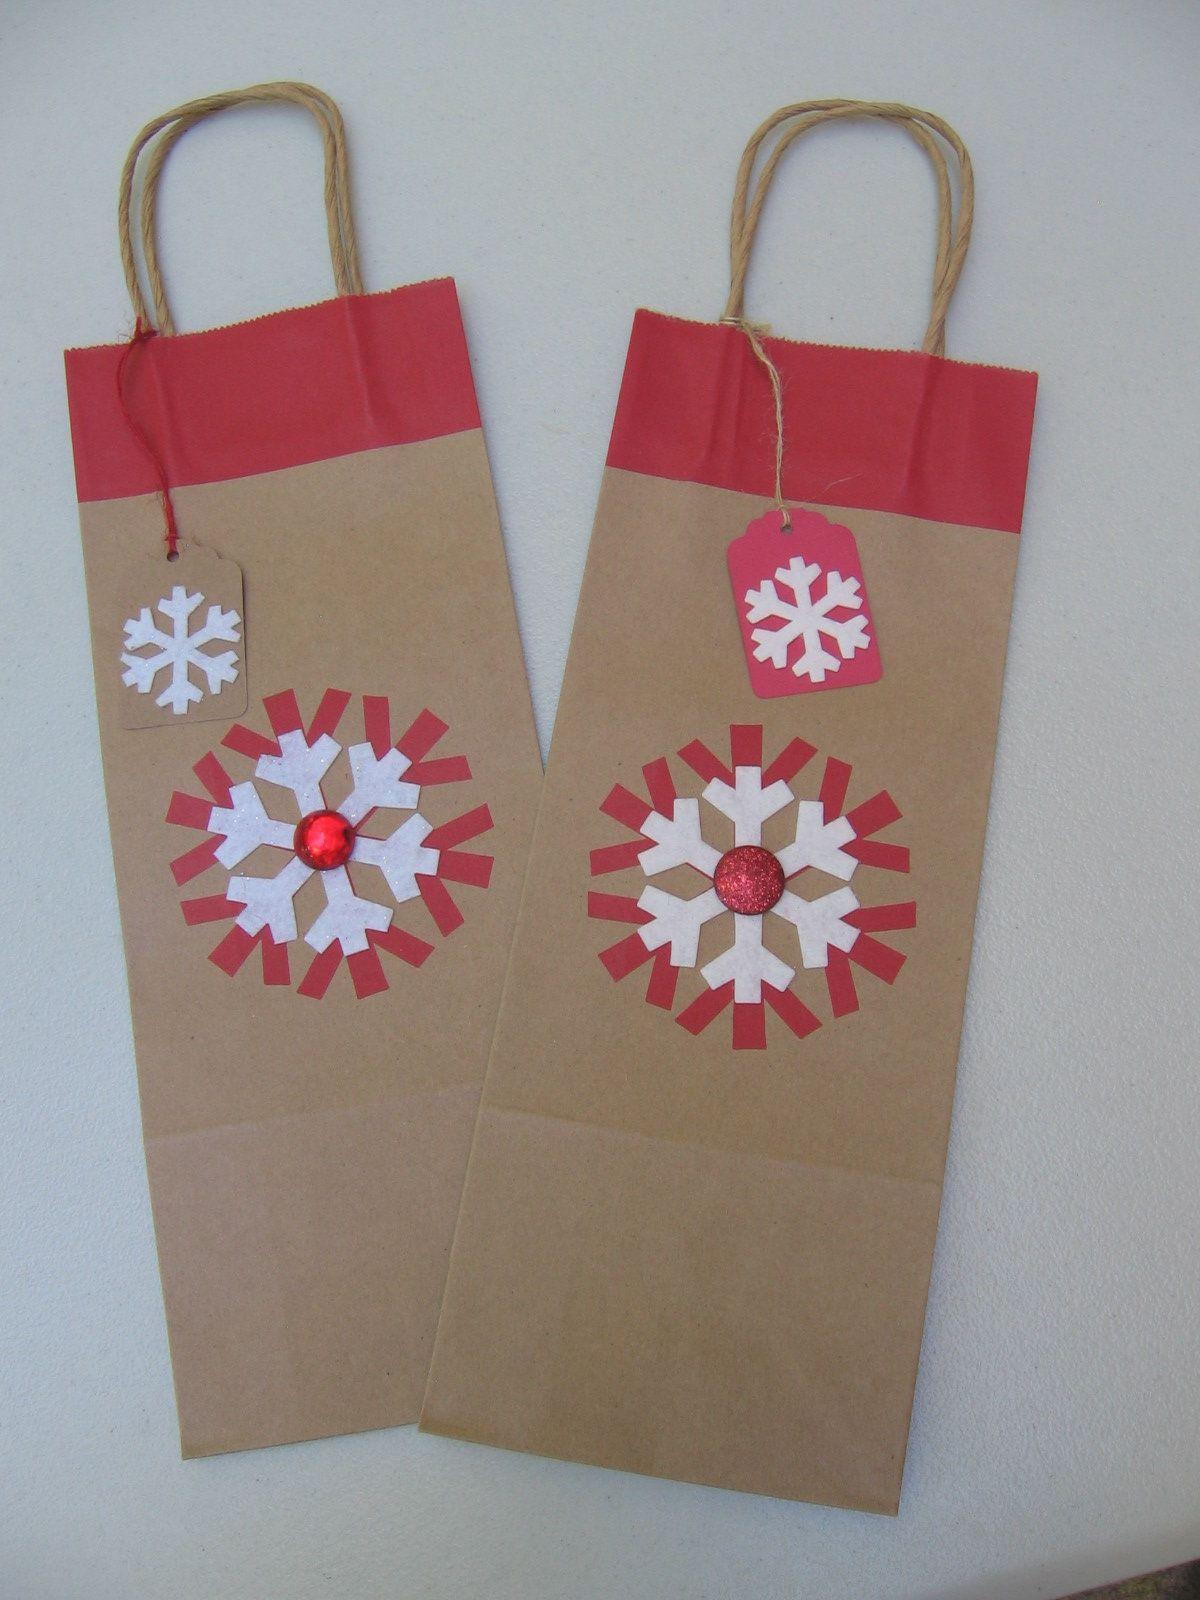 Set Of 2 Christmas Snowflake Bottle Gift Bags Brown And Red Gift Bag Gift Bag With Tag Wine Gift Holder Bag T Bottle Gift Red Gift Christmas Snowflakes